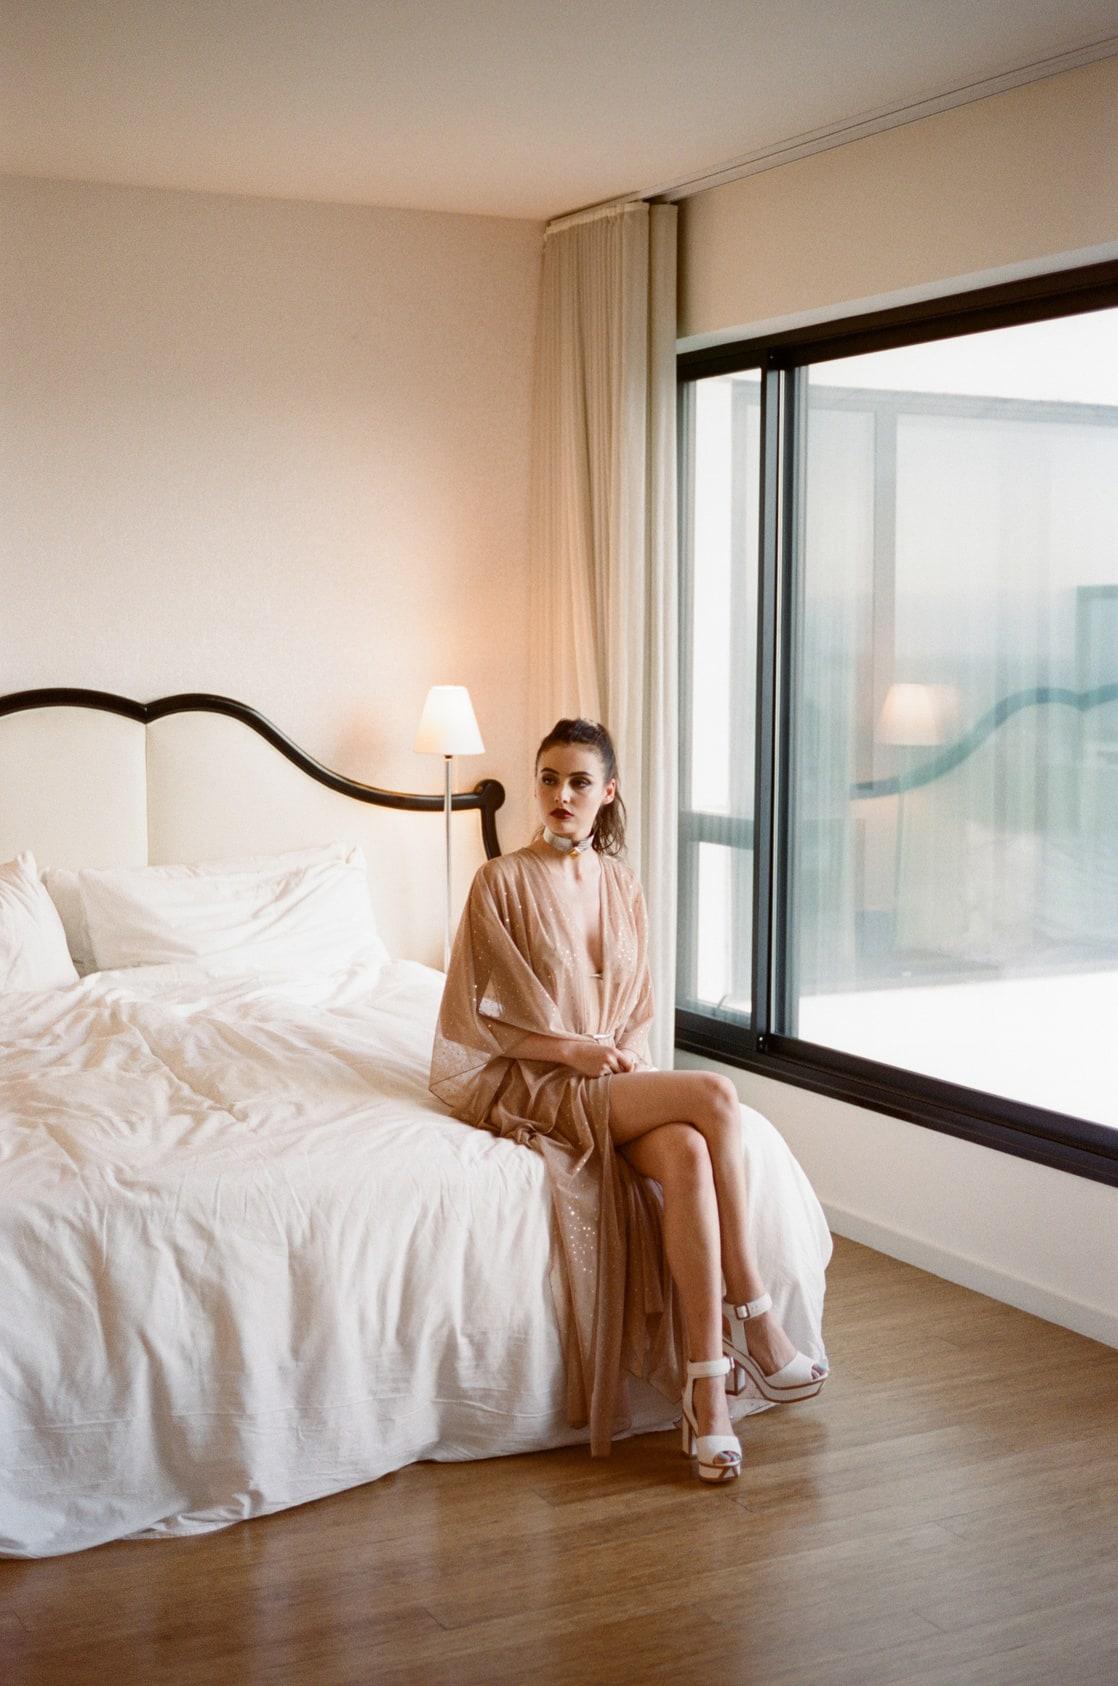 Pics Sera Mann nudes (73 photo), Sexy, Bikini, Twitter, braless 2018